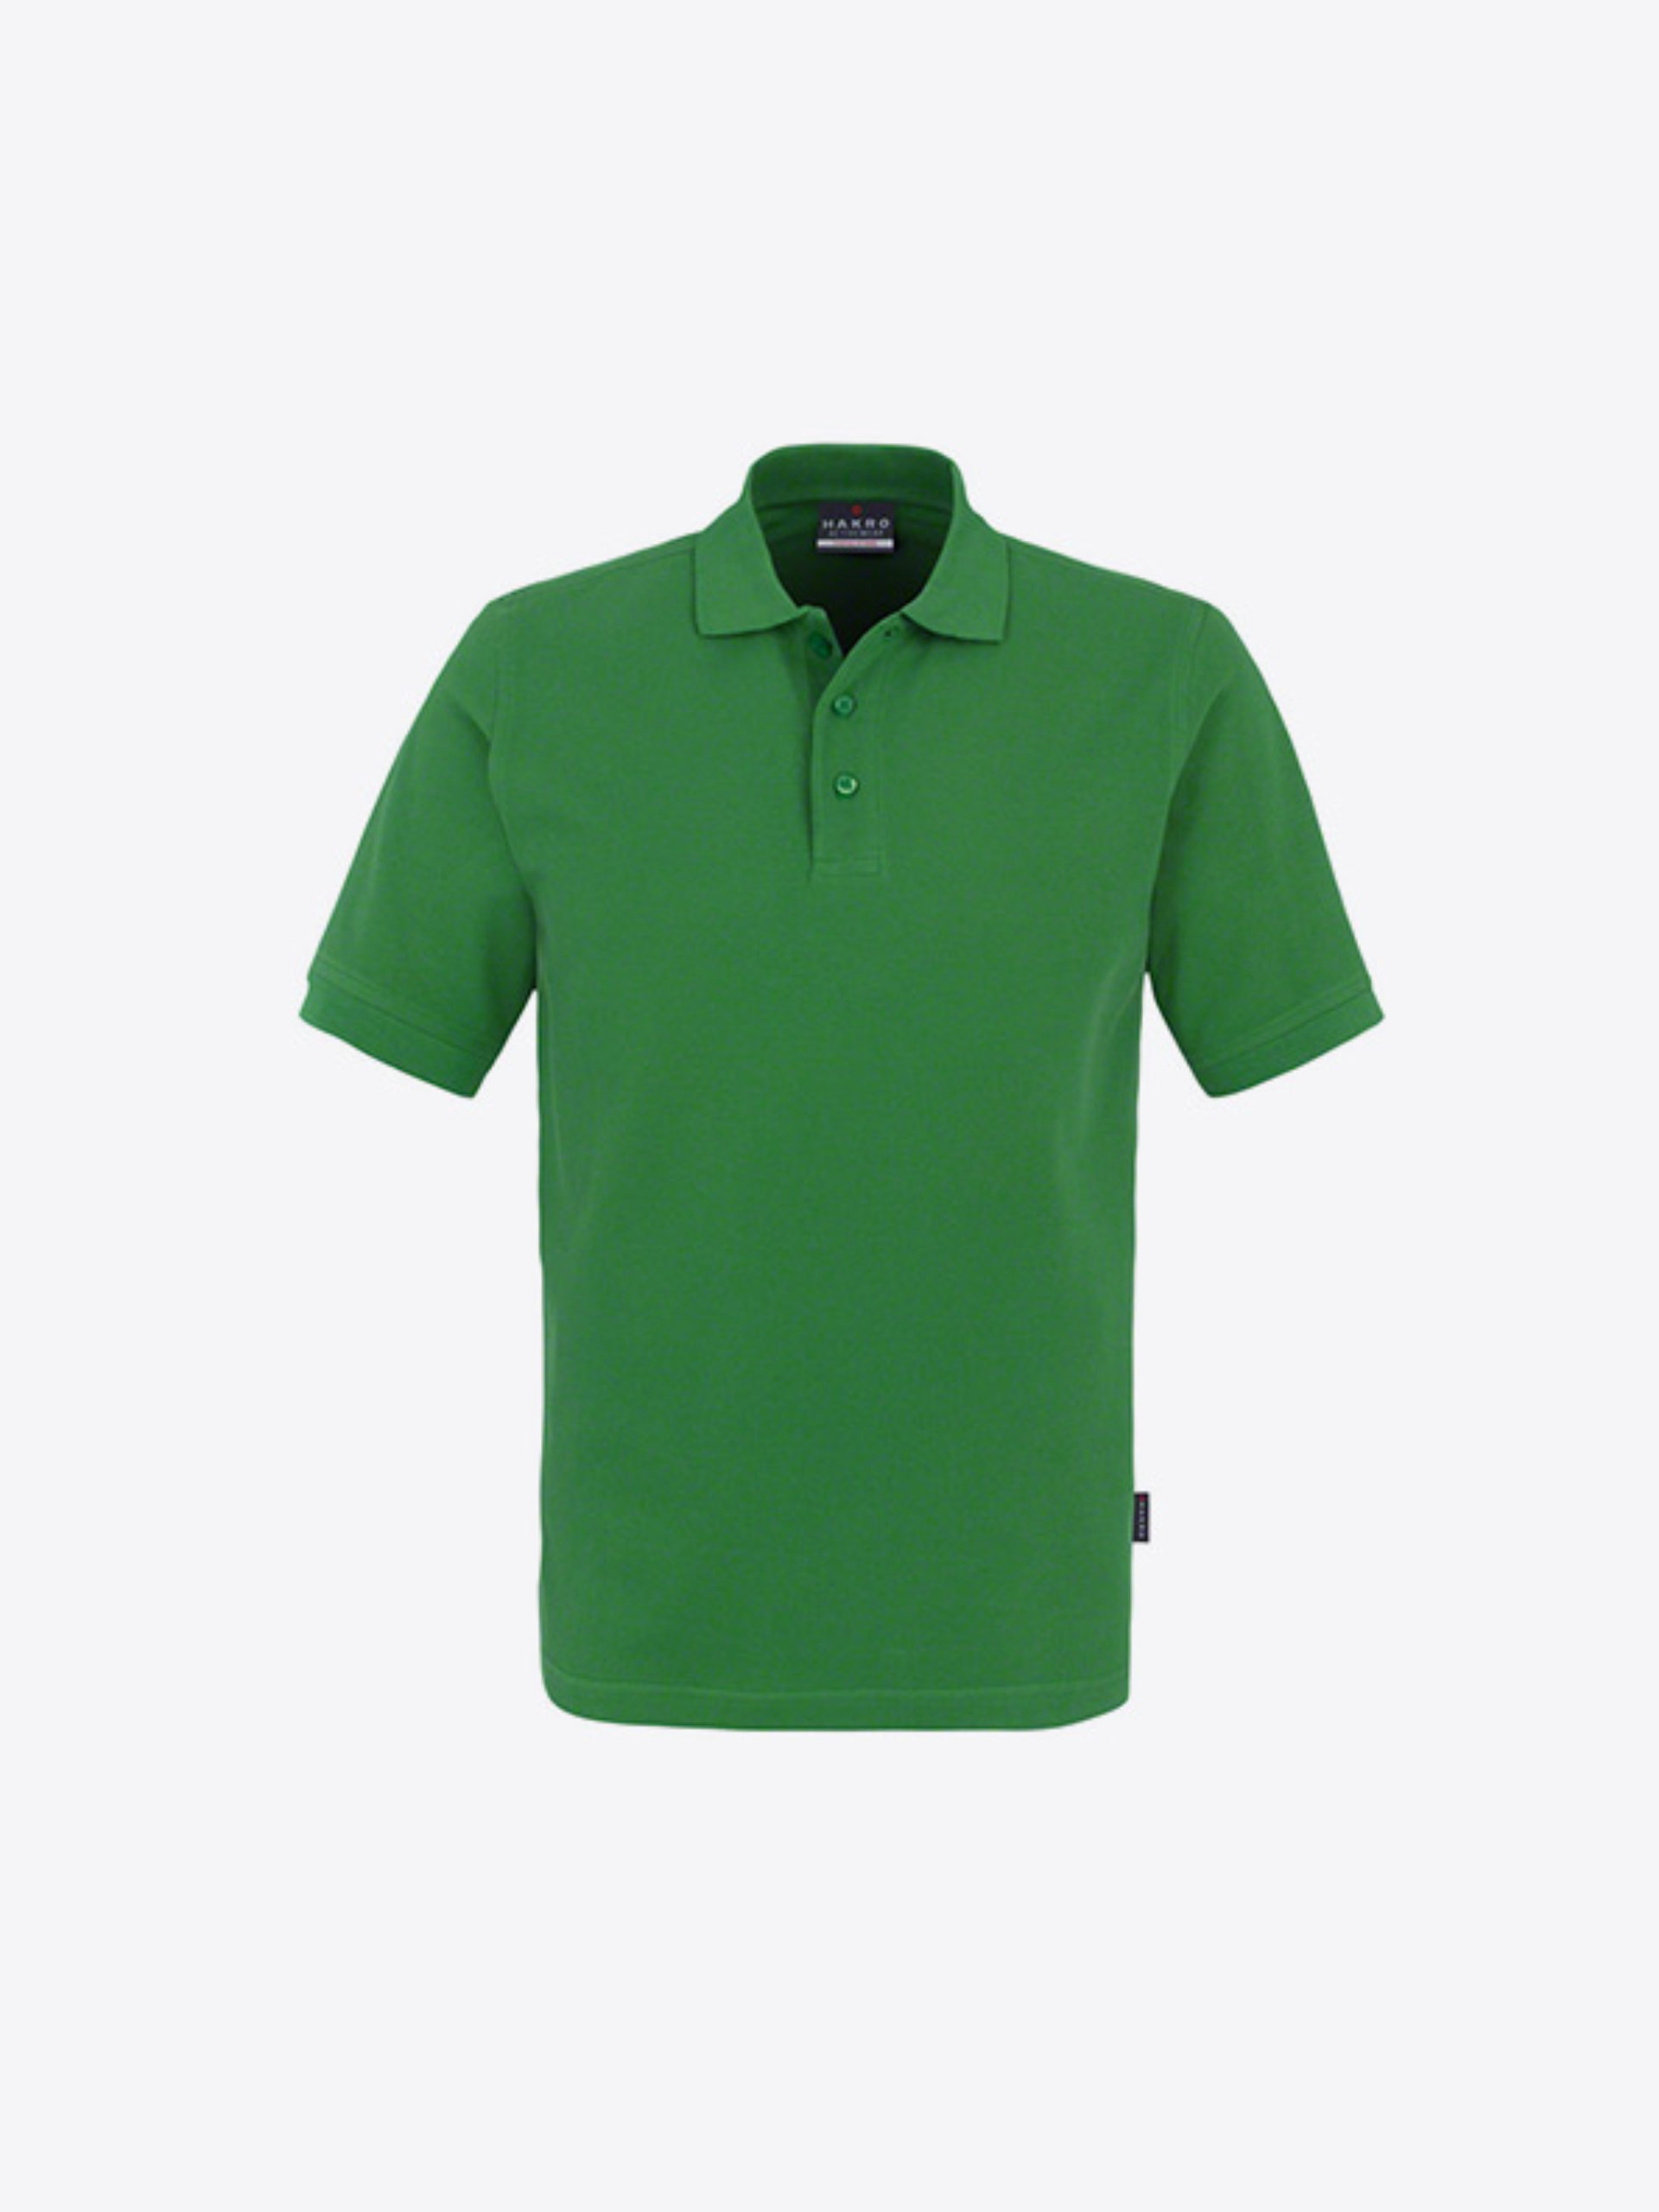 Herren Polo Shirt Mit Logo Besticken Hakro 810 Classic Wasabi